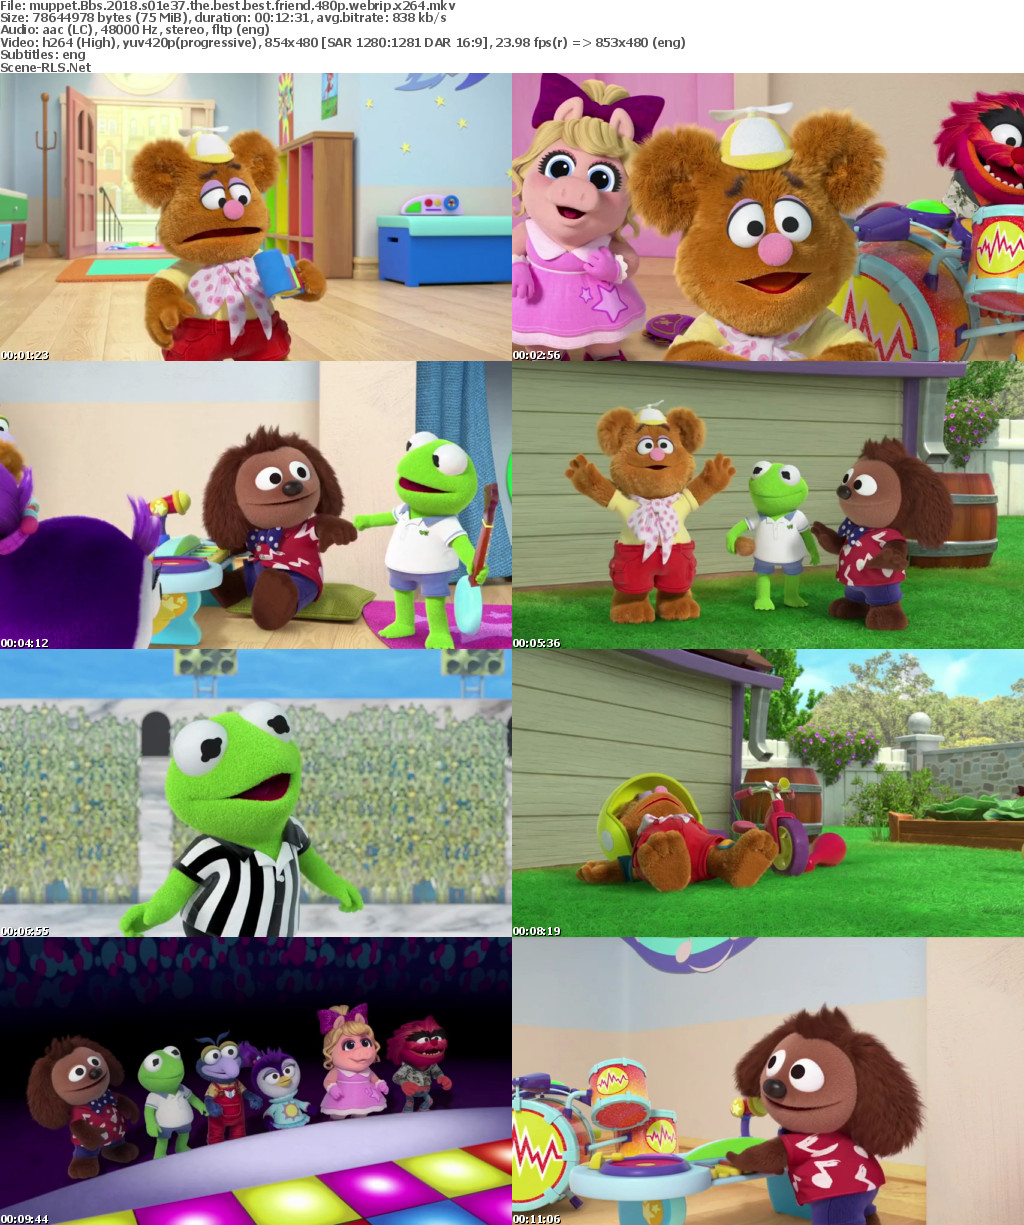 Muppet Babies 2018 S01E37 The Best Best Friend 720p DSNY